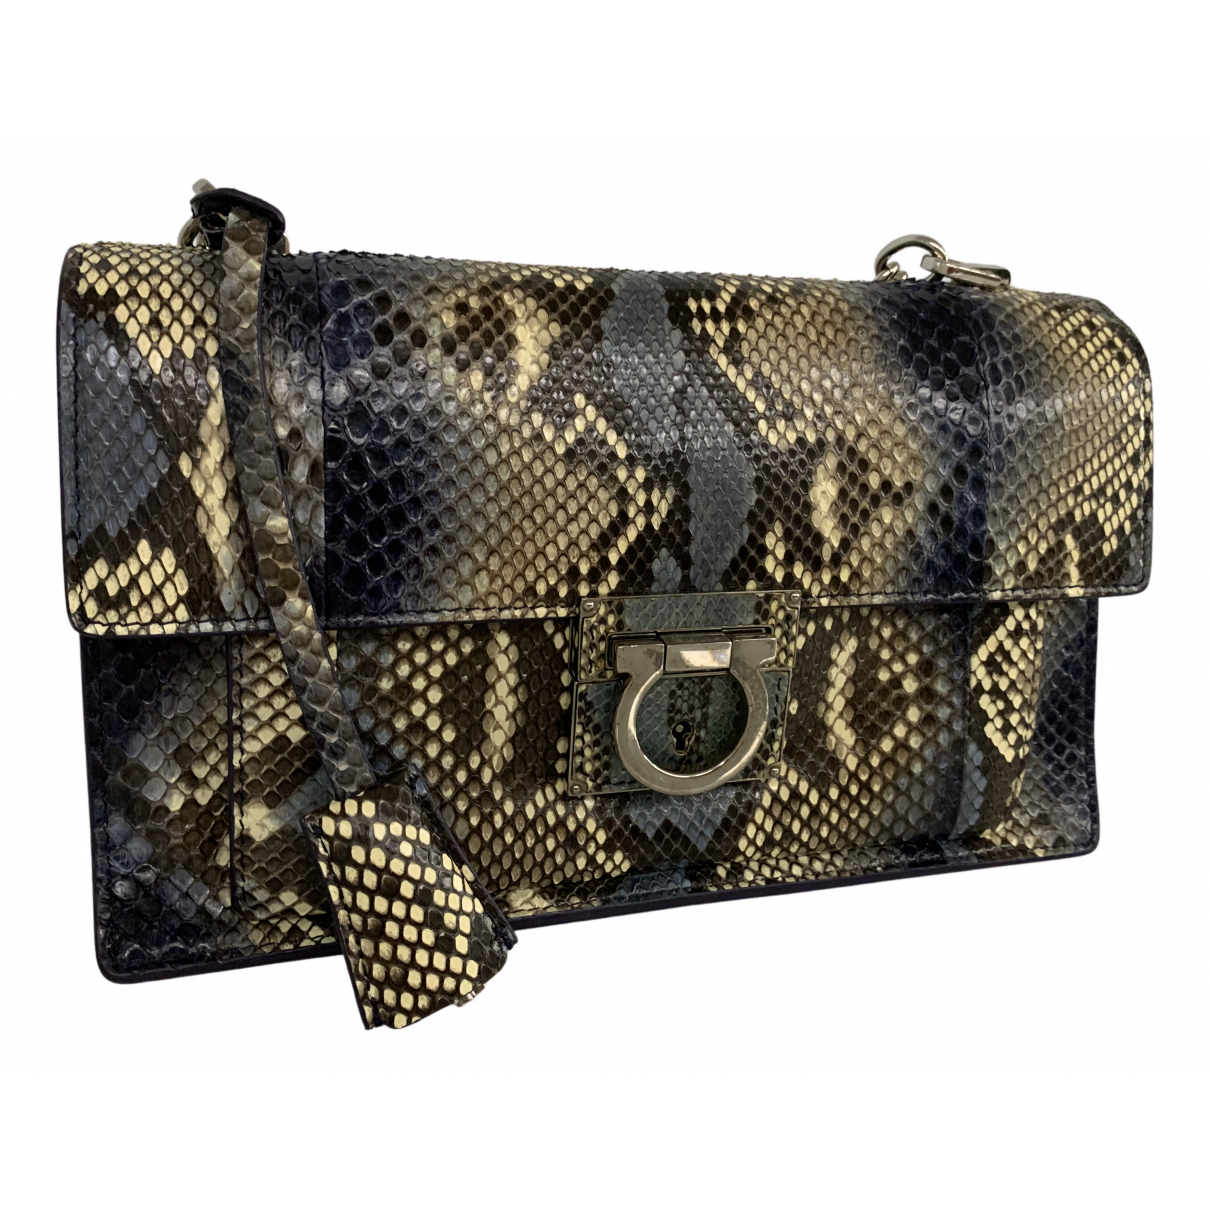 Salvatore Ferragamo N Blue Python handbag for Women N